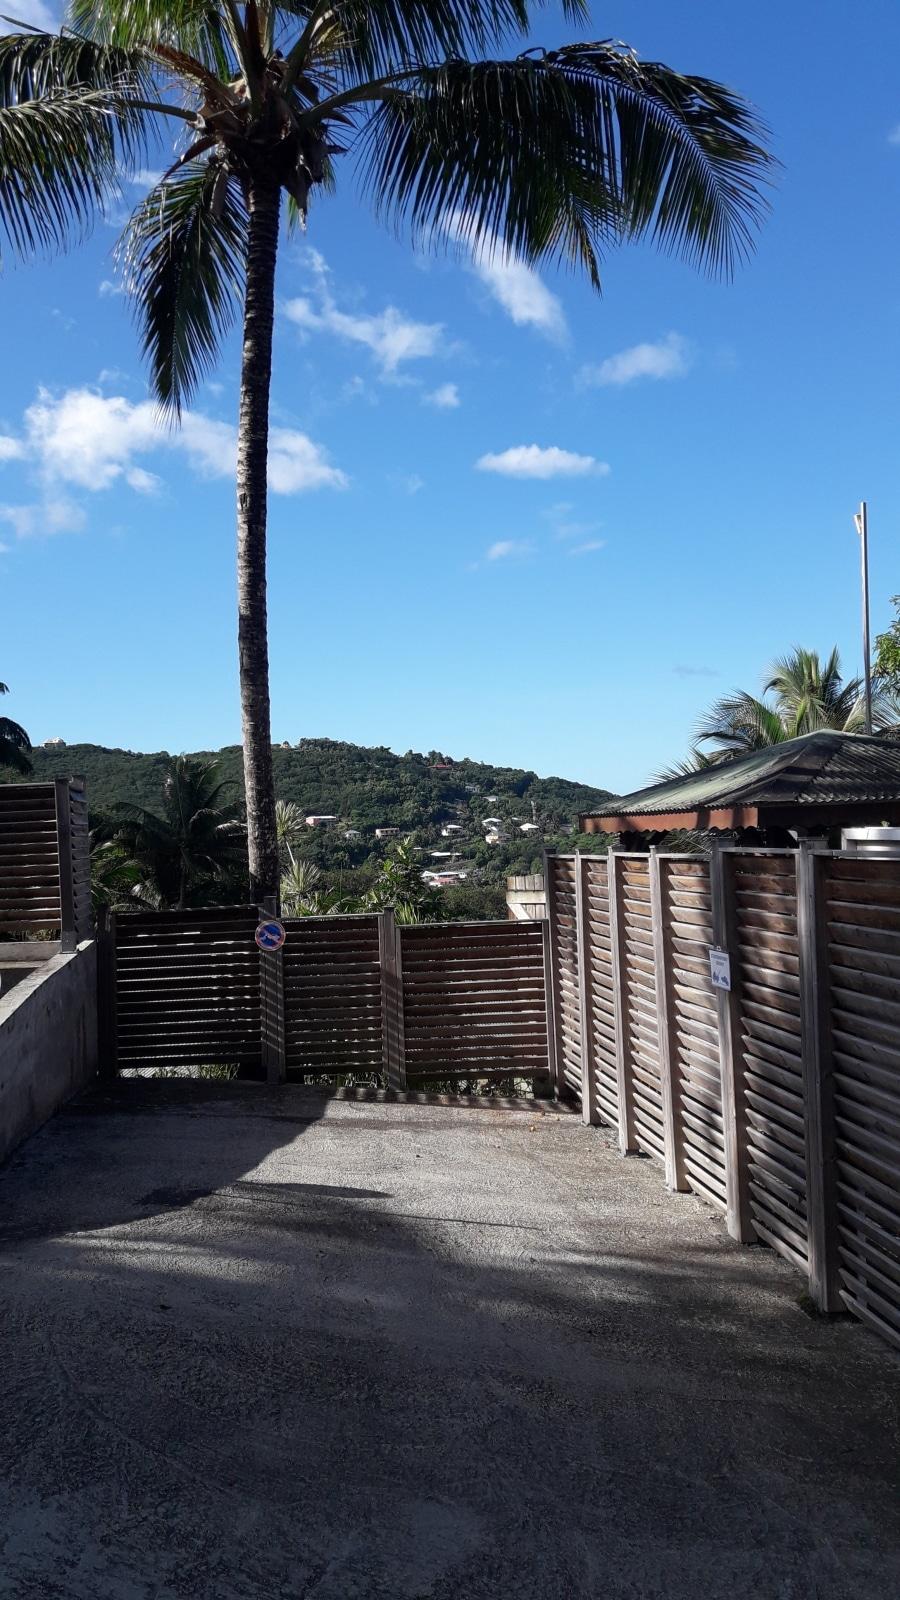 Parking Lodge Coco - Deshaies, Guadeloupe